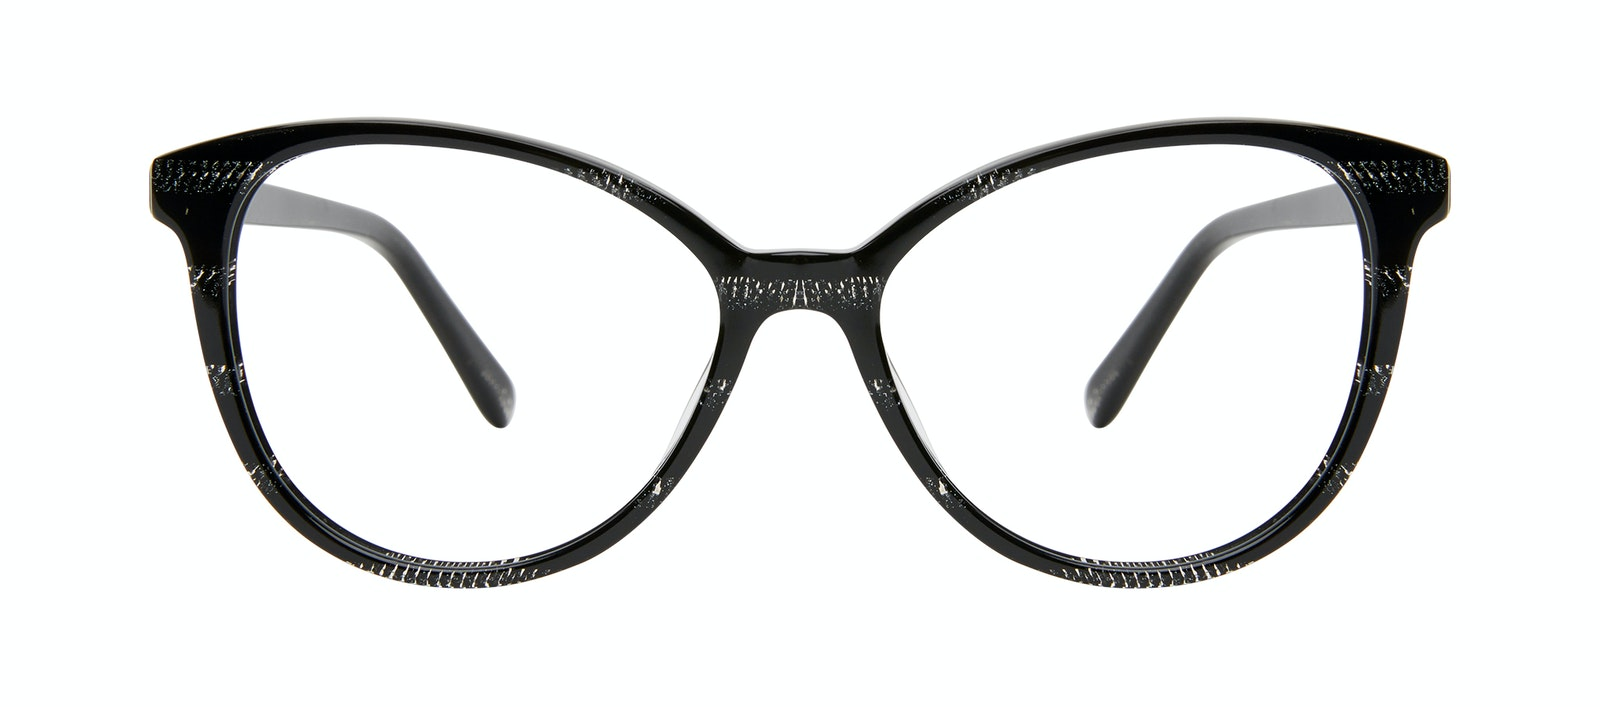 Affordable Fashion Glasses Cat Eye Eyeglasses Women Esprit Night Front